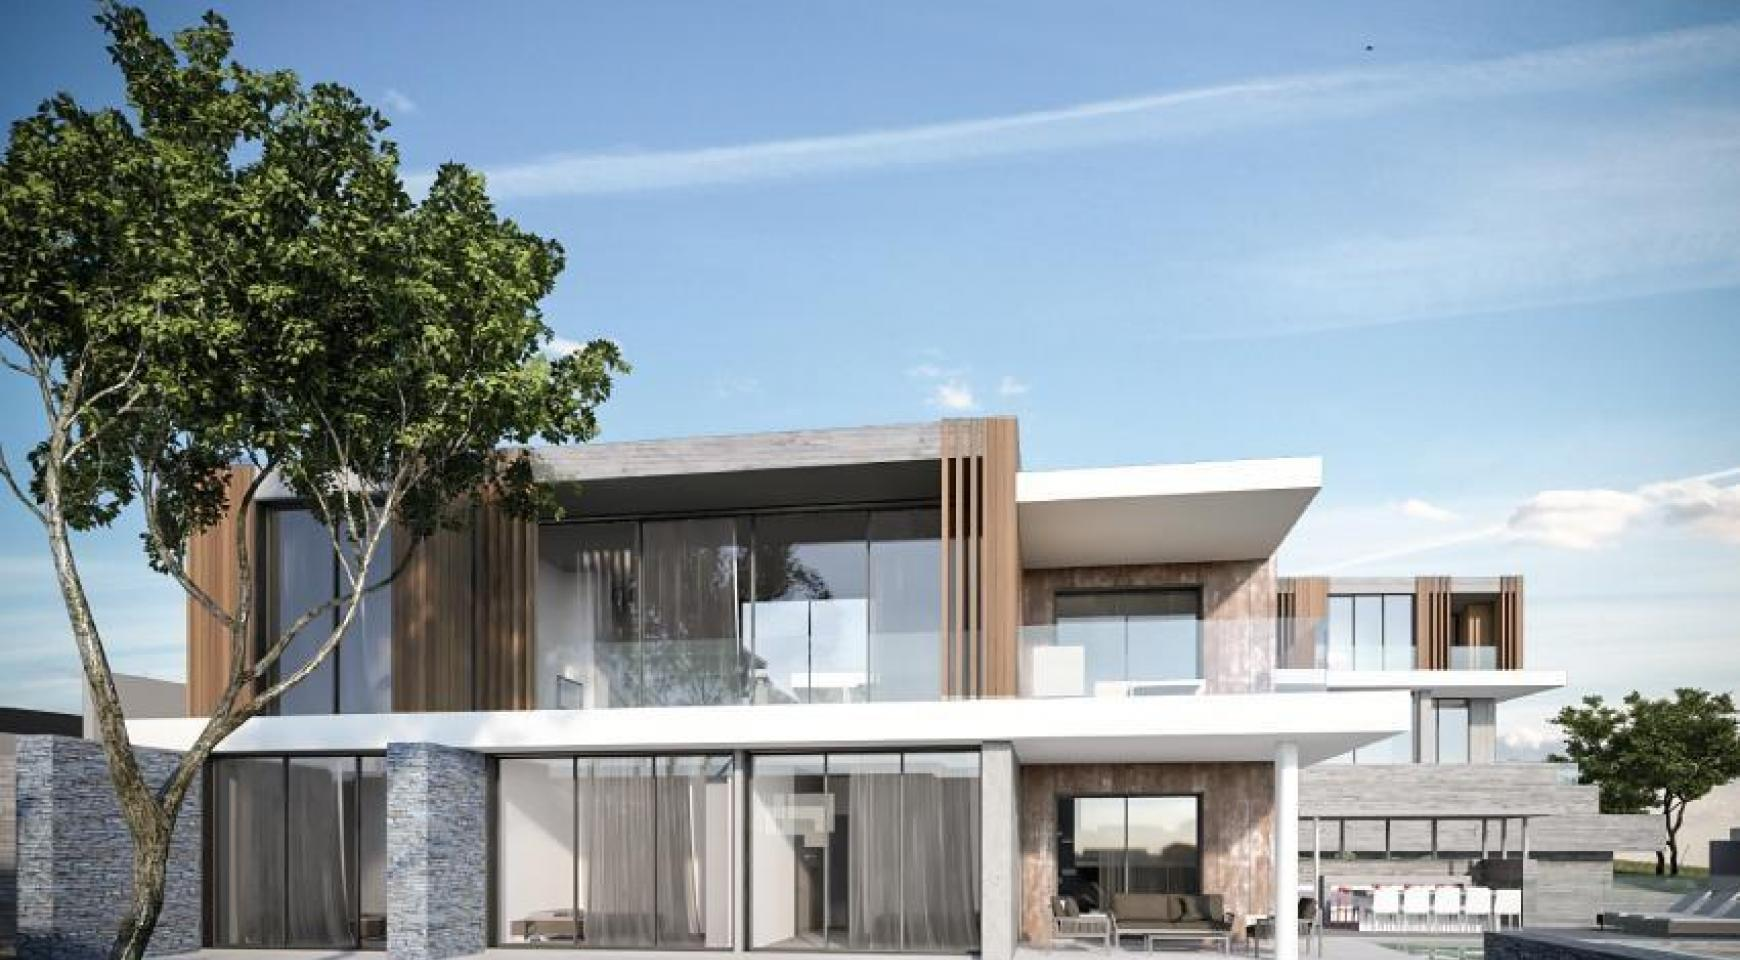 Exclusive 4 Bedroom Villa with Stunning Views in Germasogeia - 3